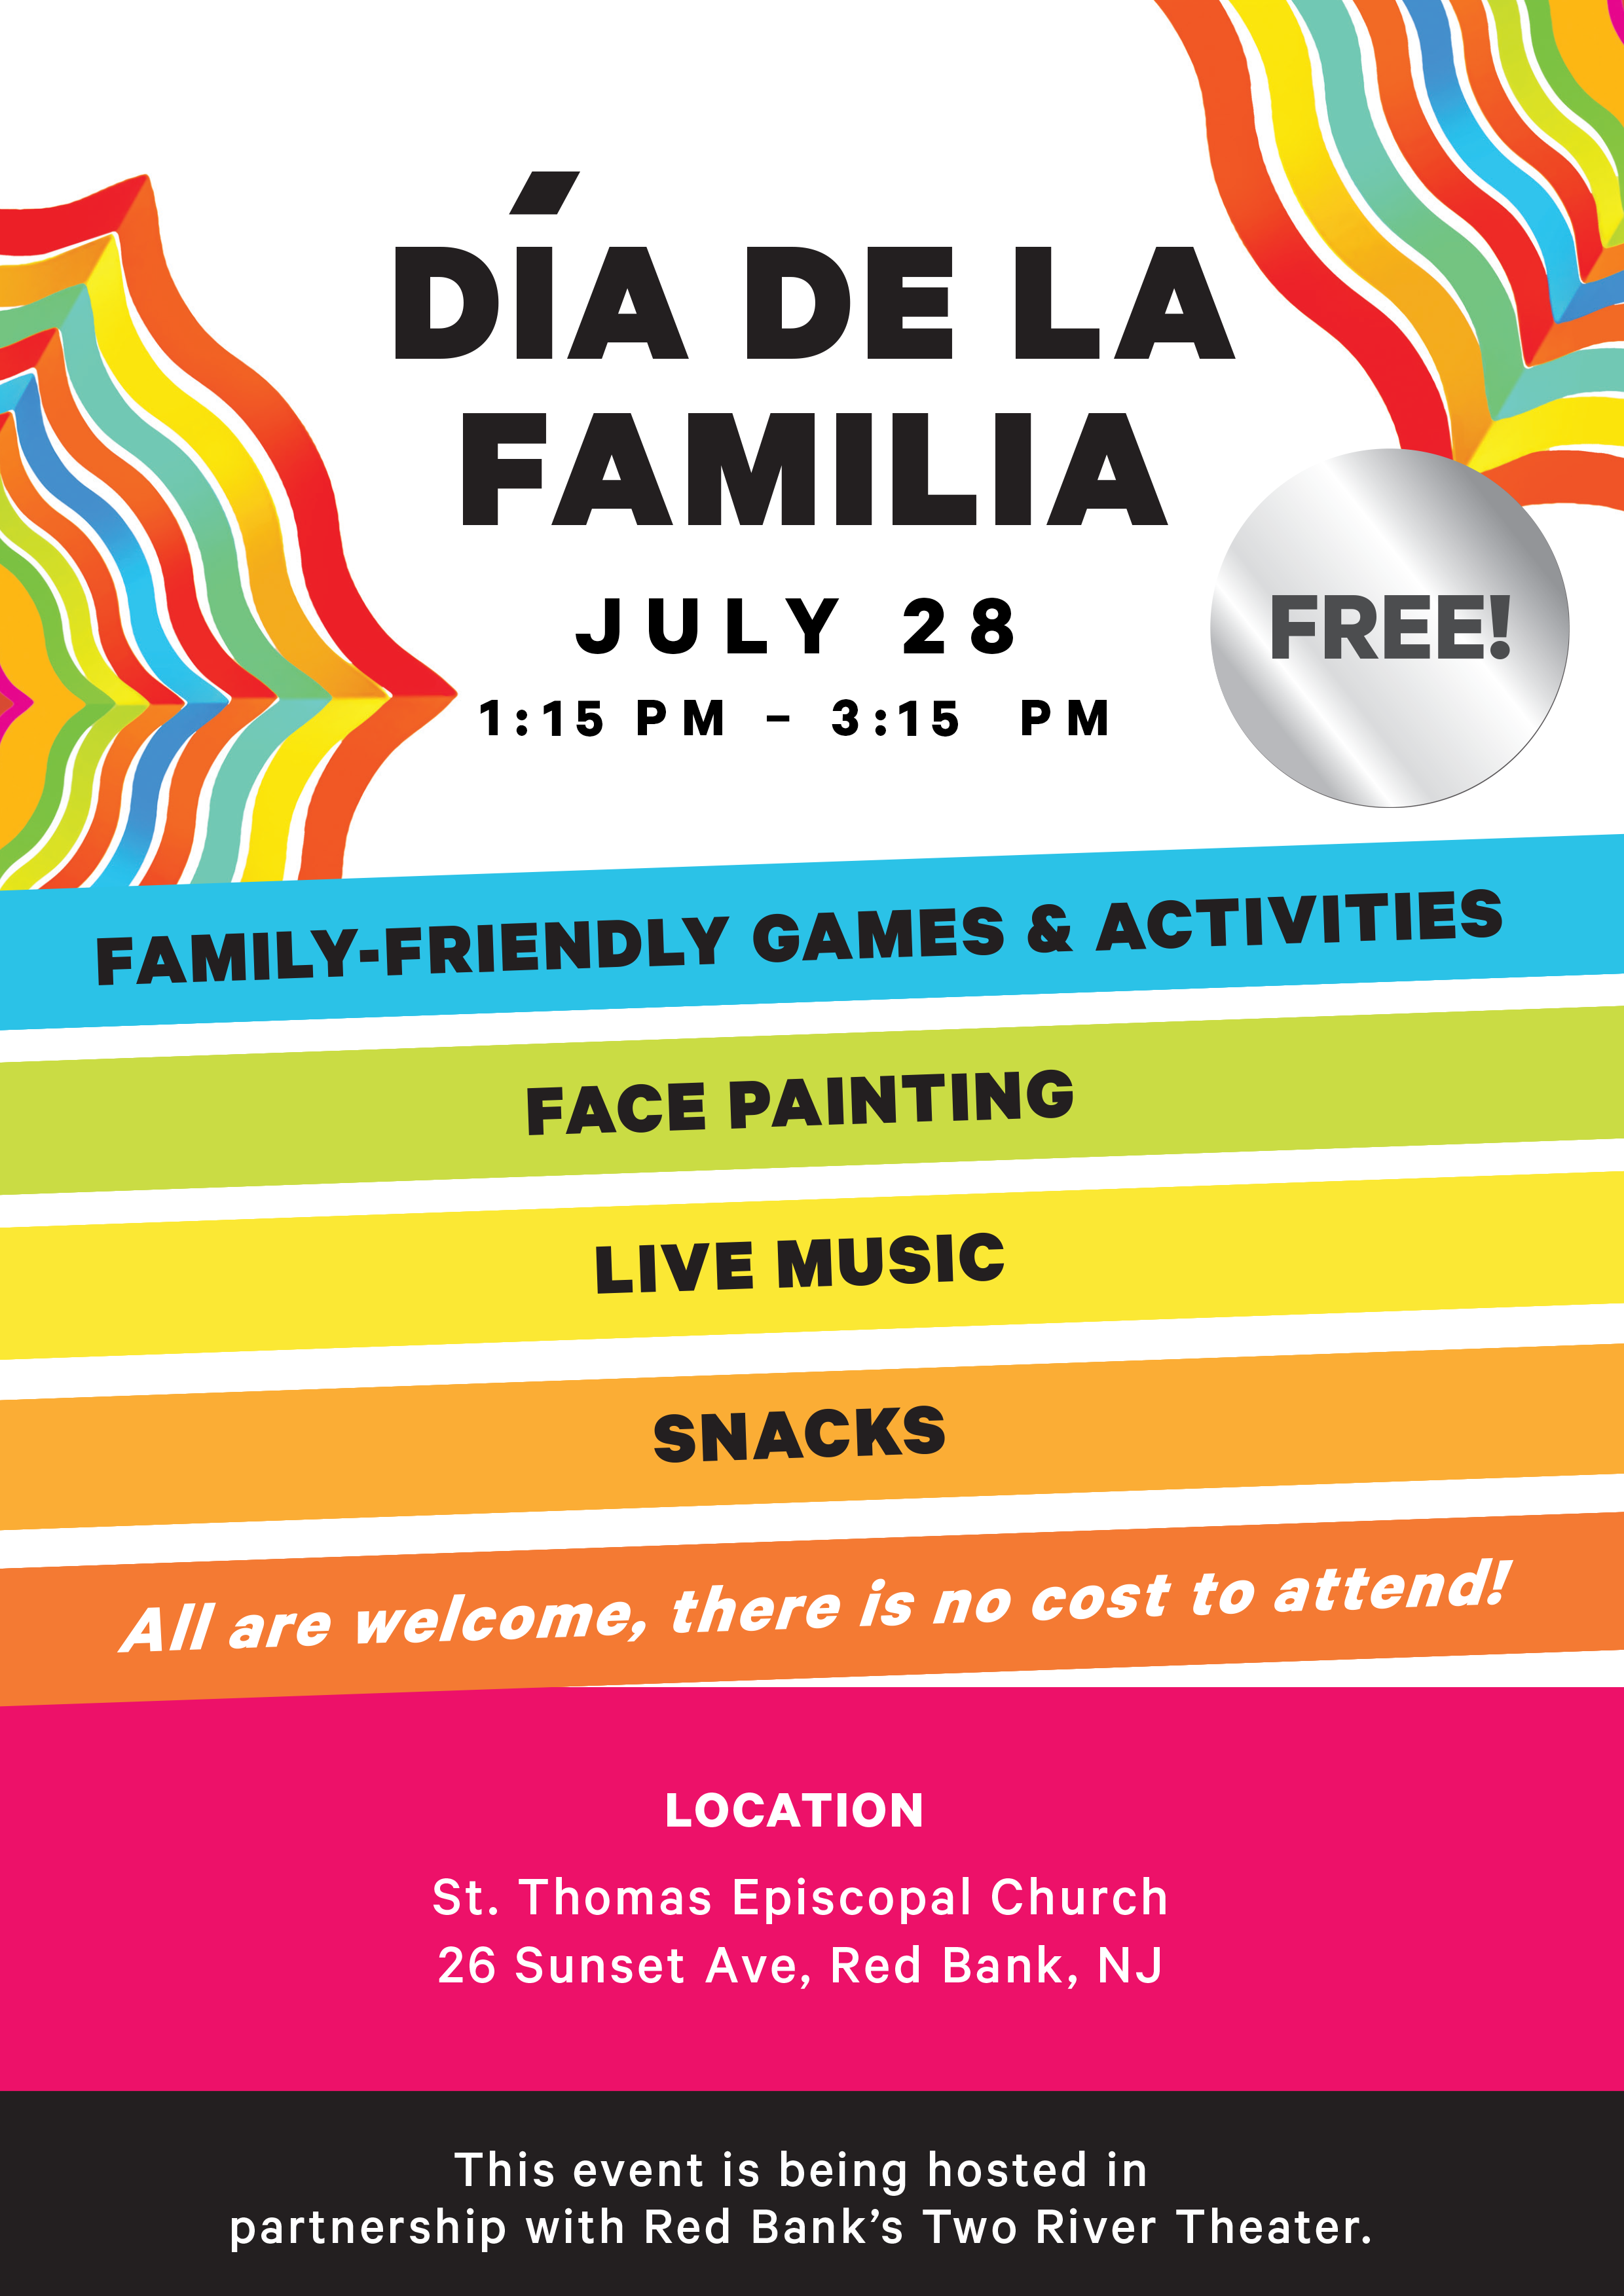 Dia de la Familia Flyer_July 28_St. Thomas Episcopal Church-1.png